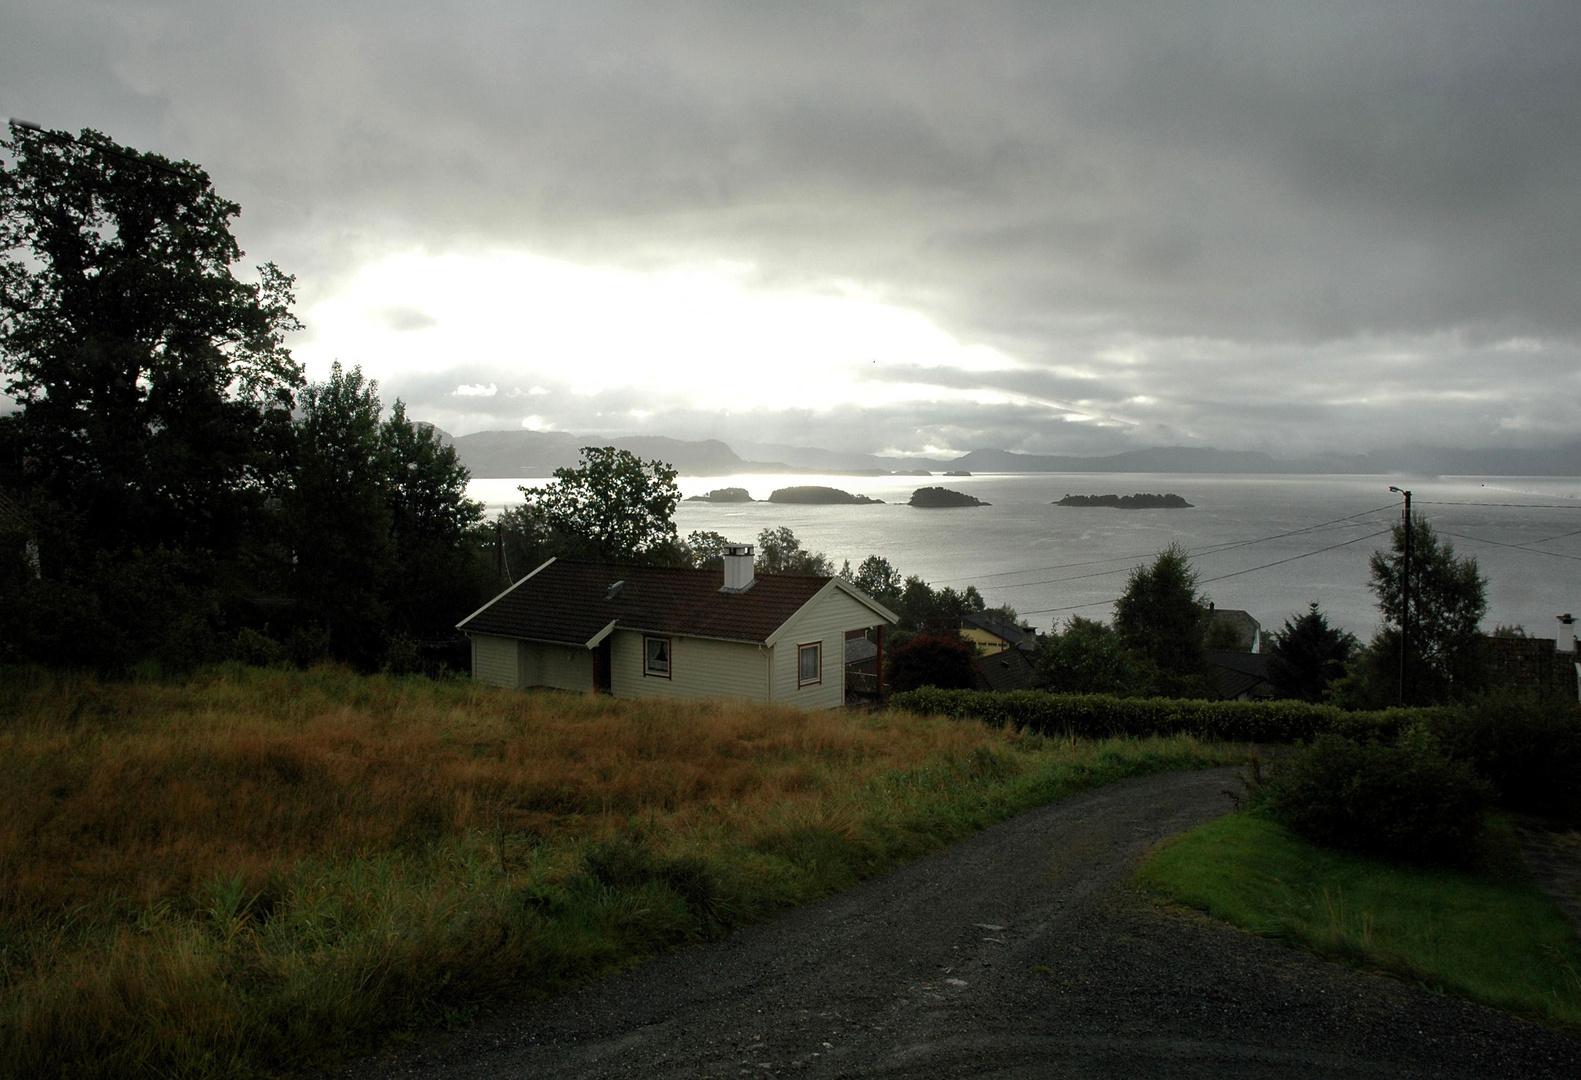 Stimmungsvoller Hardanger Fjord (Norwegen) 2005